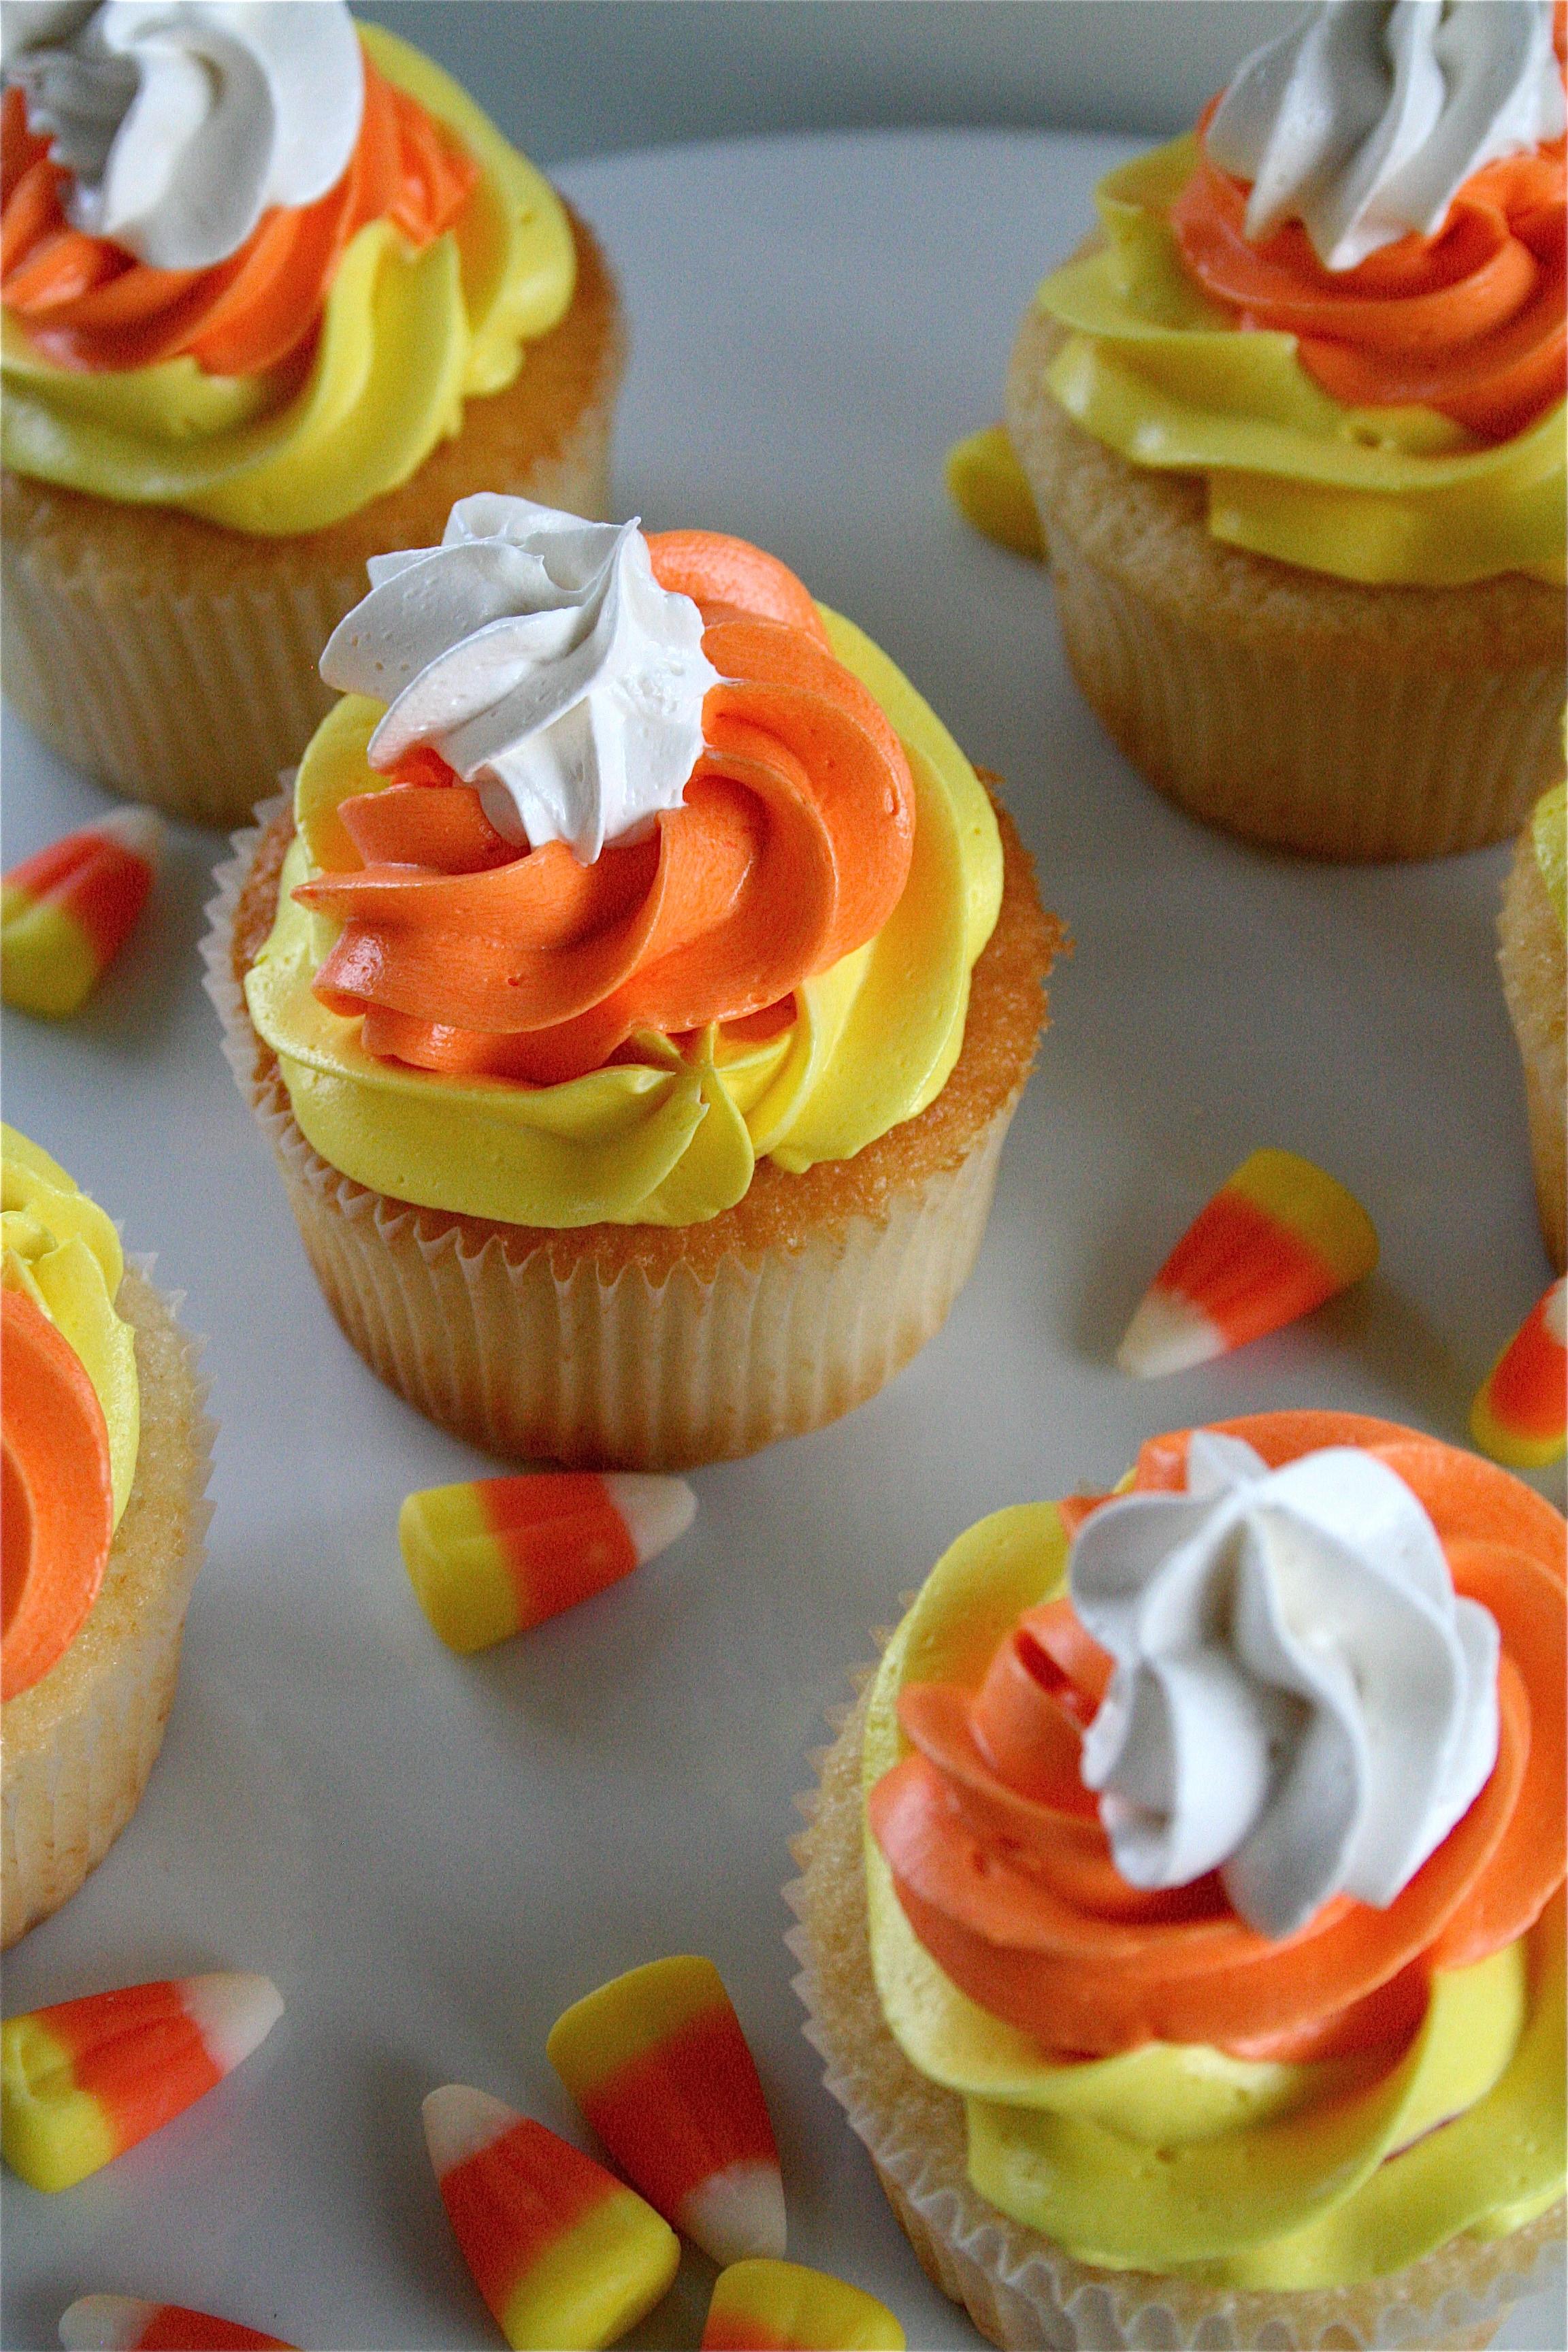 Halloween Cupcakes Recipes  28 Cute Halloween Cupcakes Easy Recipes for Halloween